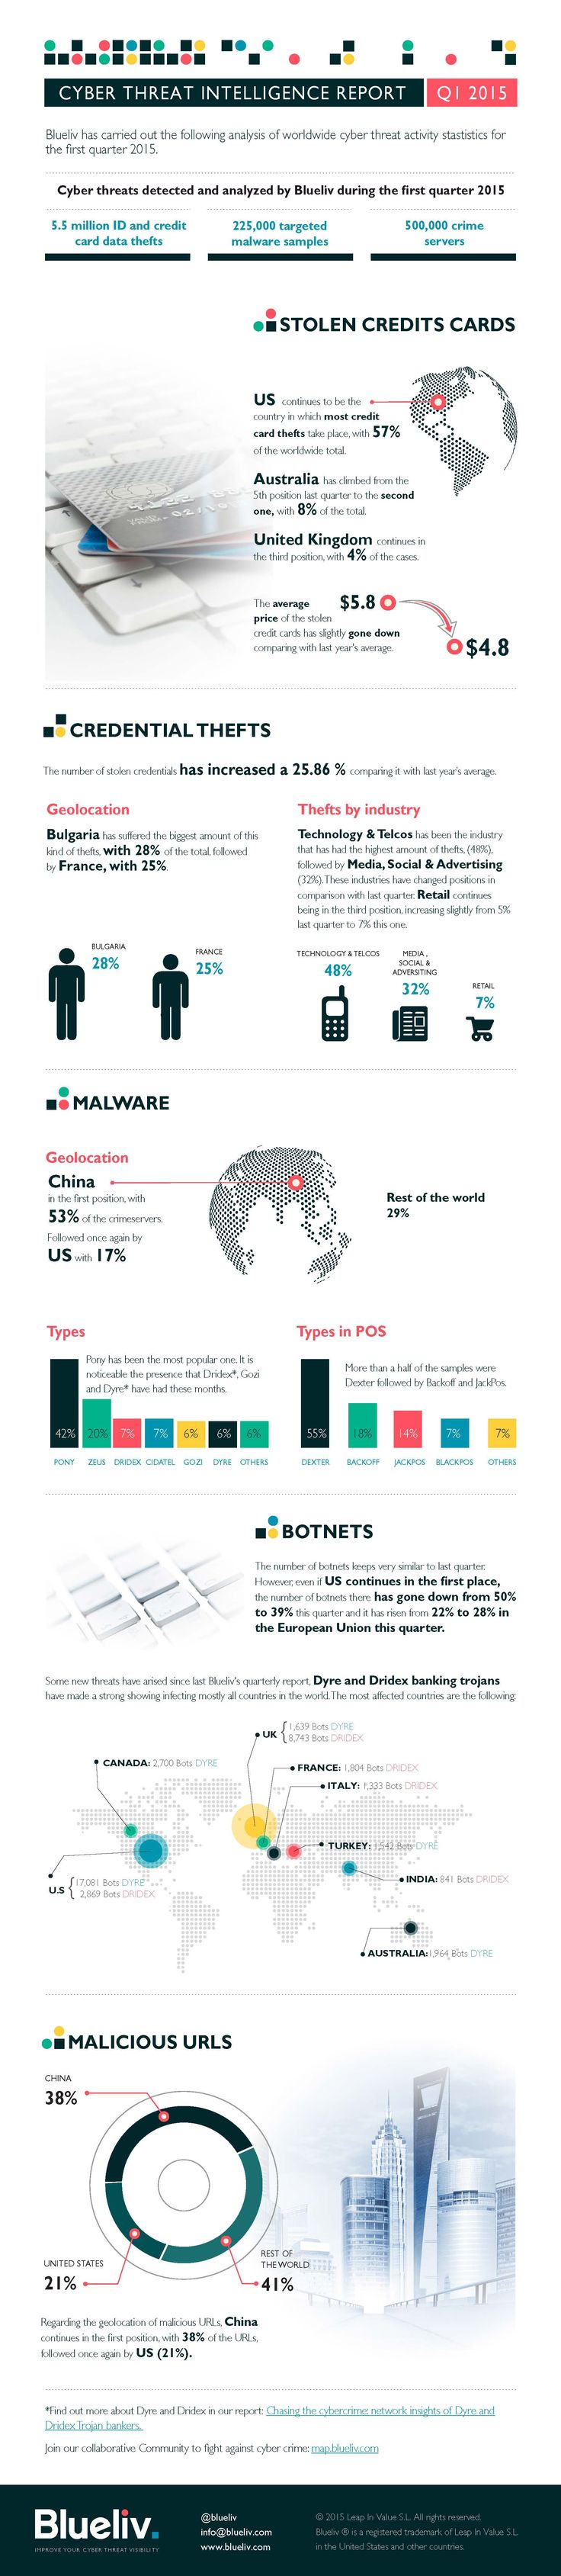 Cyber Threat Intelligence statistics Q1 2015